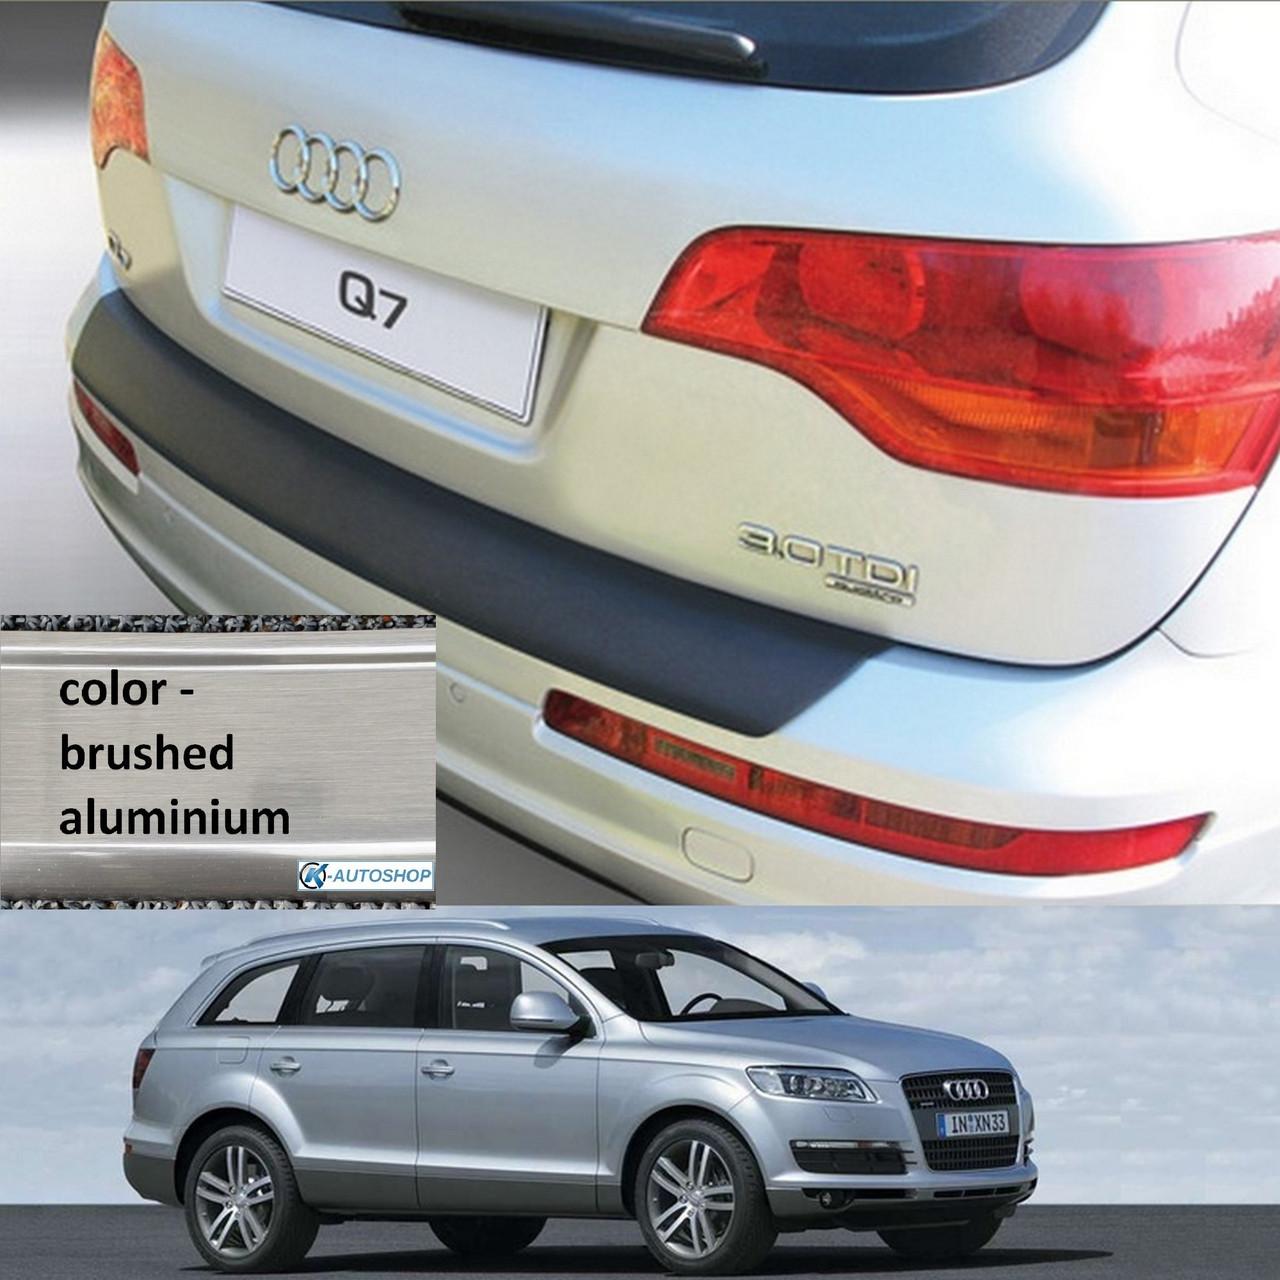 Пластиковая защитная накладка на задний бампер для Audi Q7 2006-2015